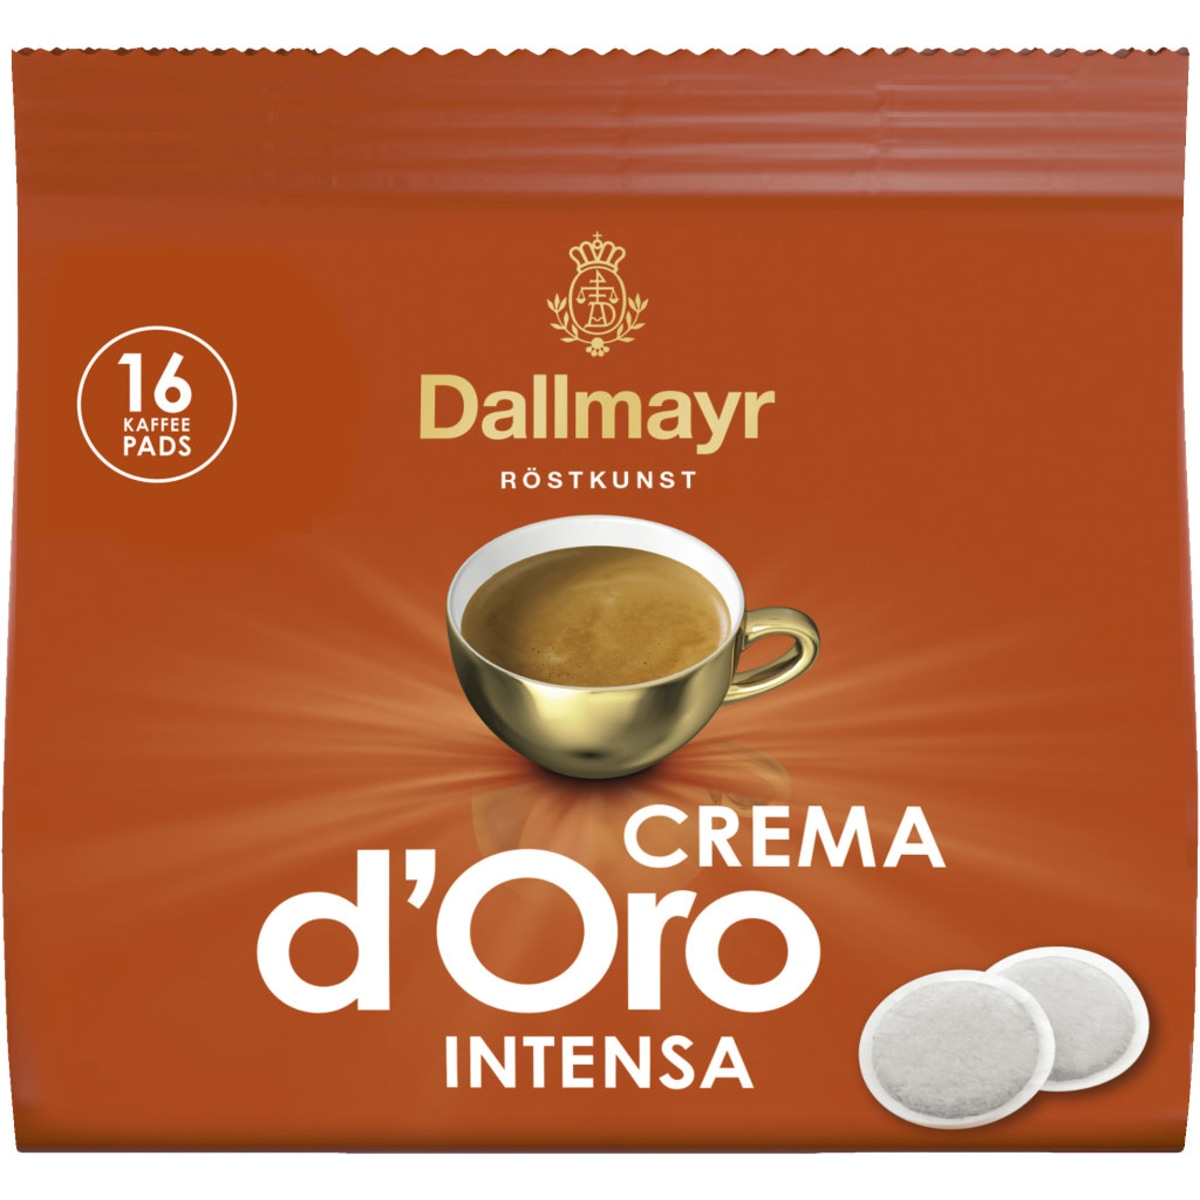 Dallmayr Crema d´Oro Intensa 16er Pads